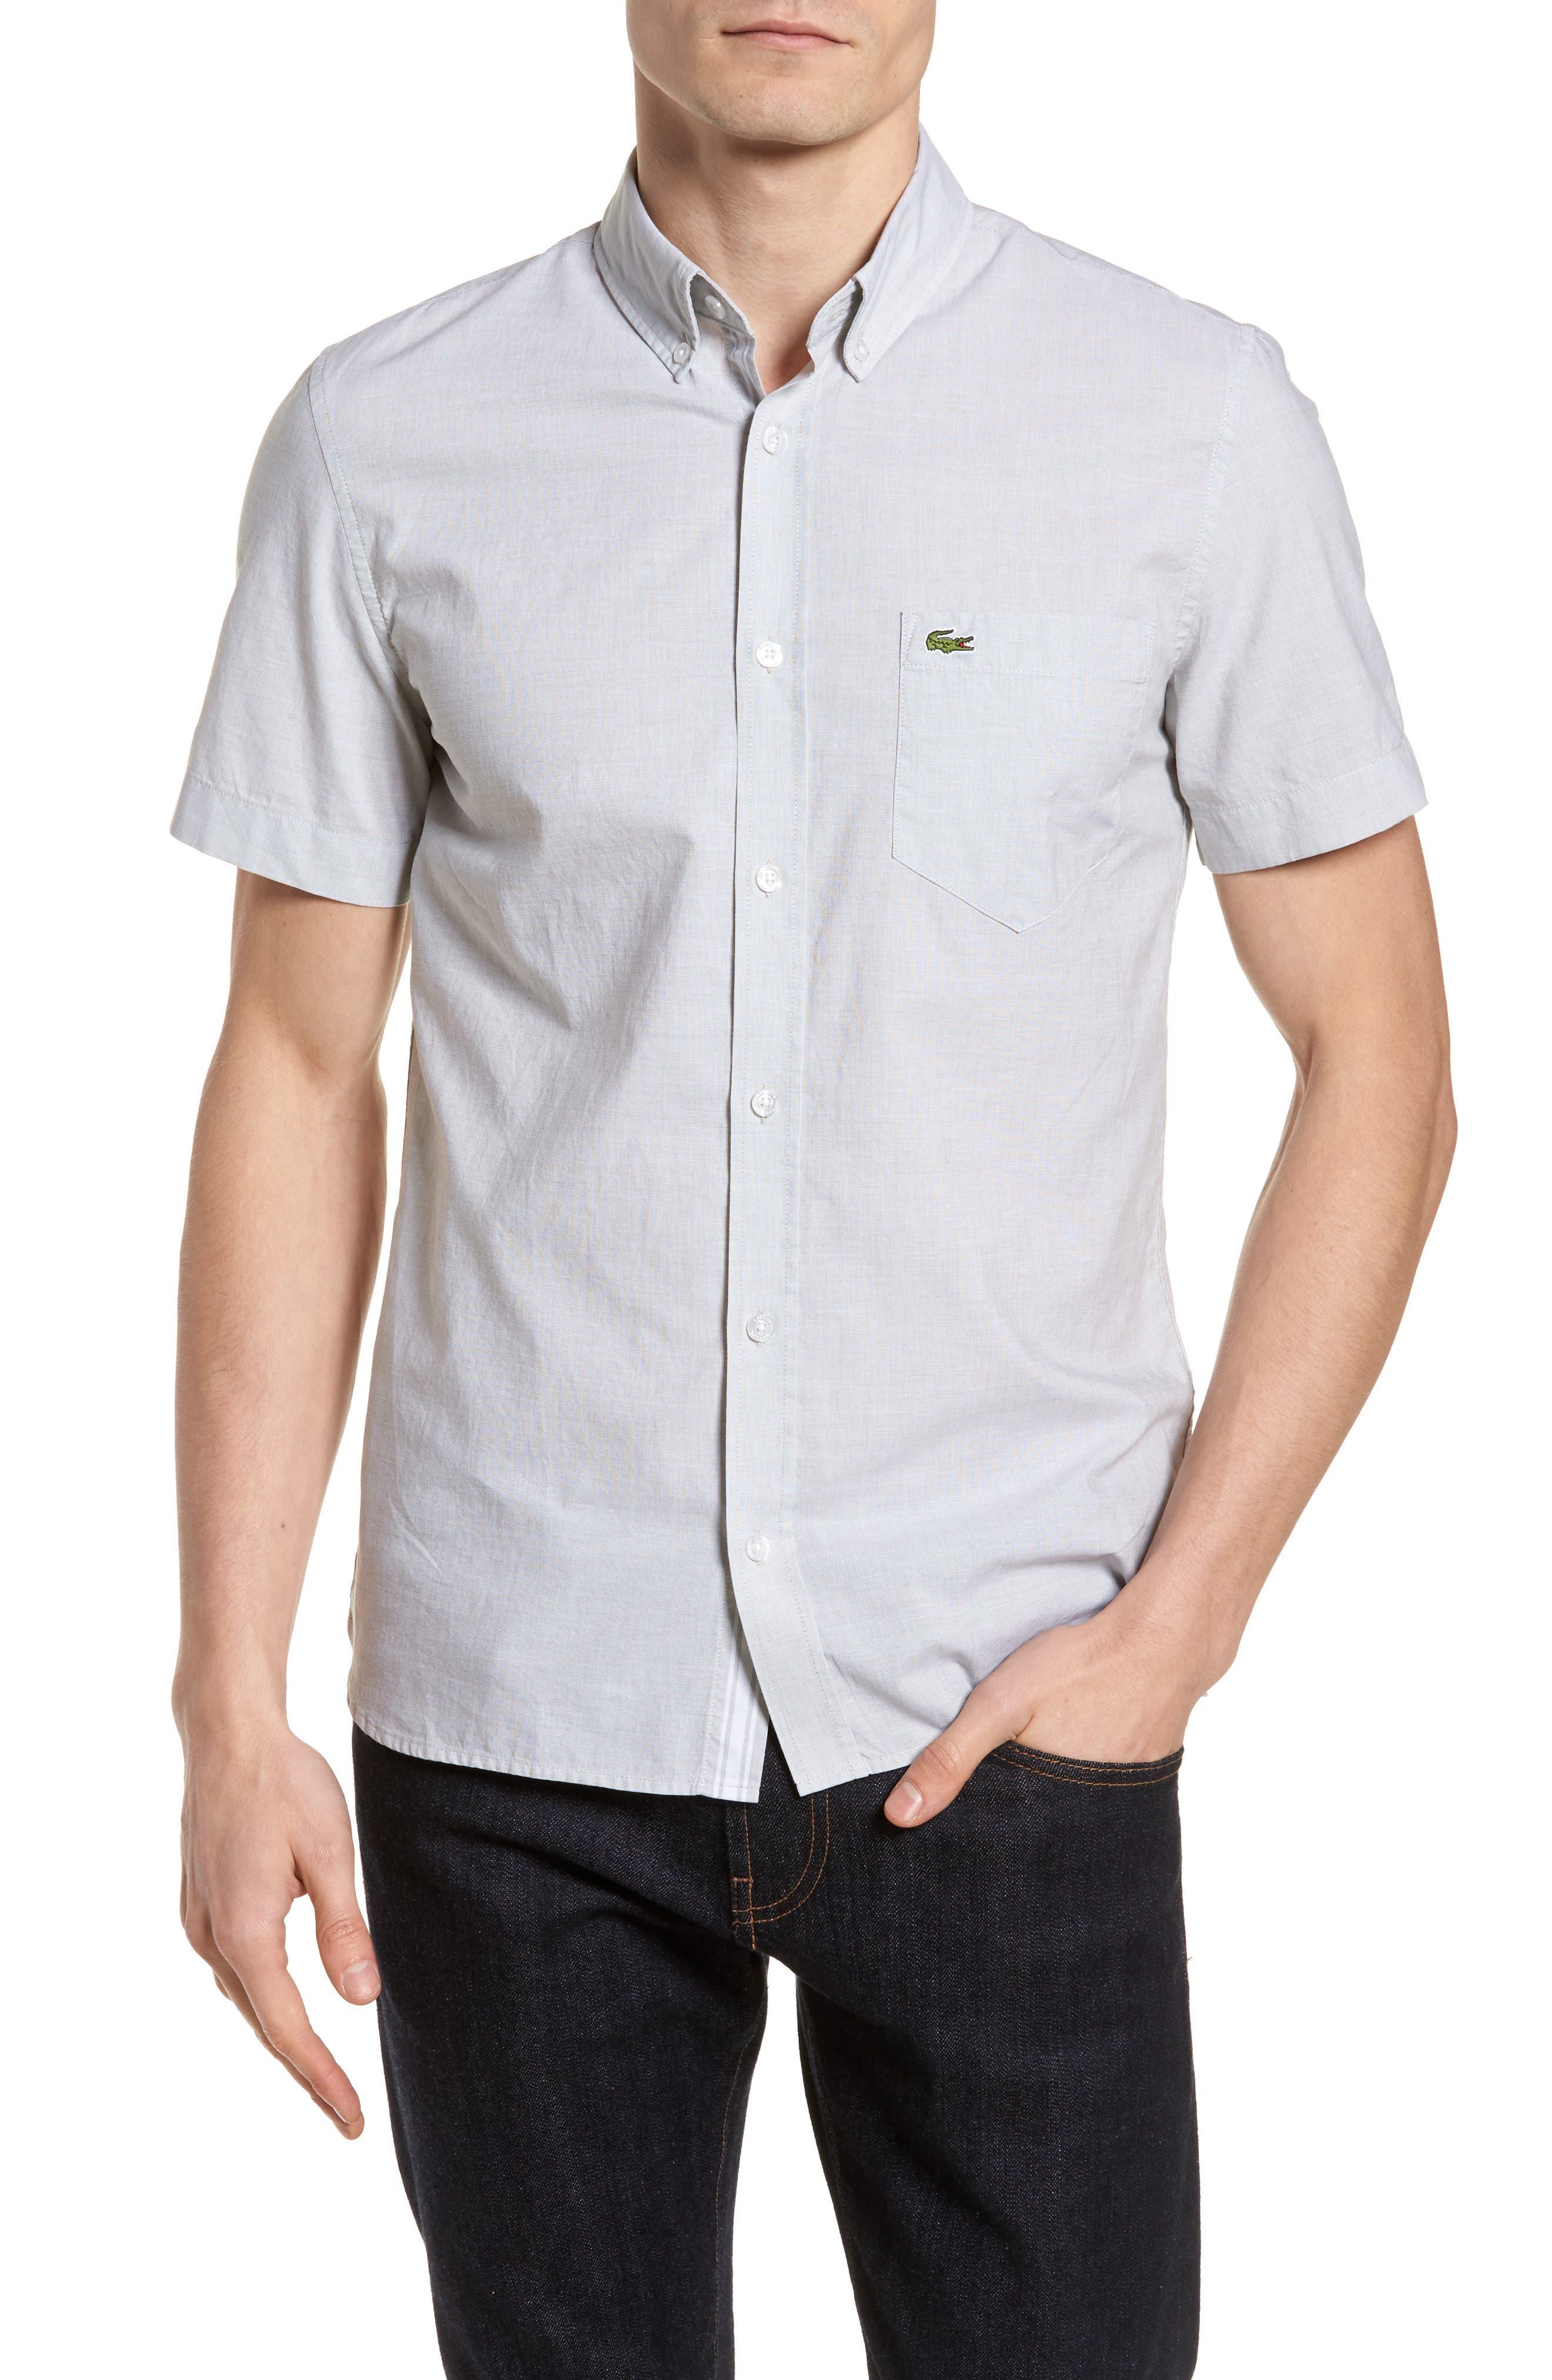 Alternate Image 1 Selected - Lacoste Slim Fit Sport Shirt